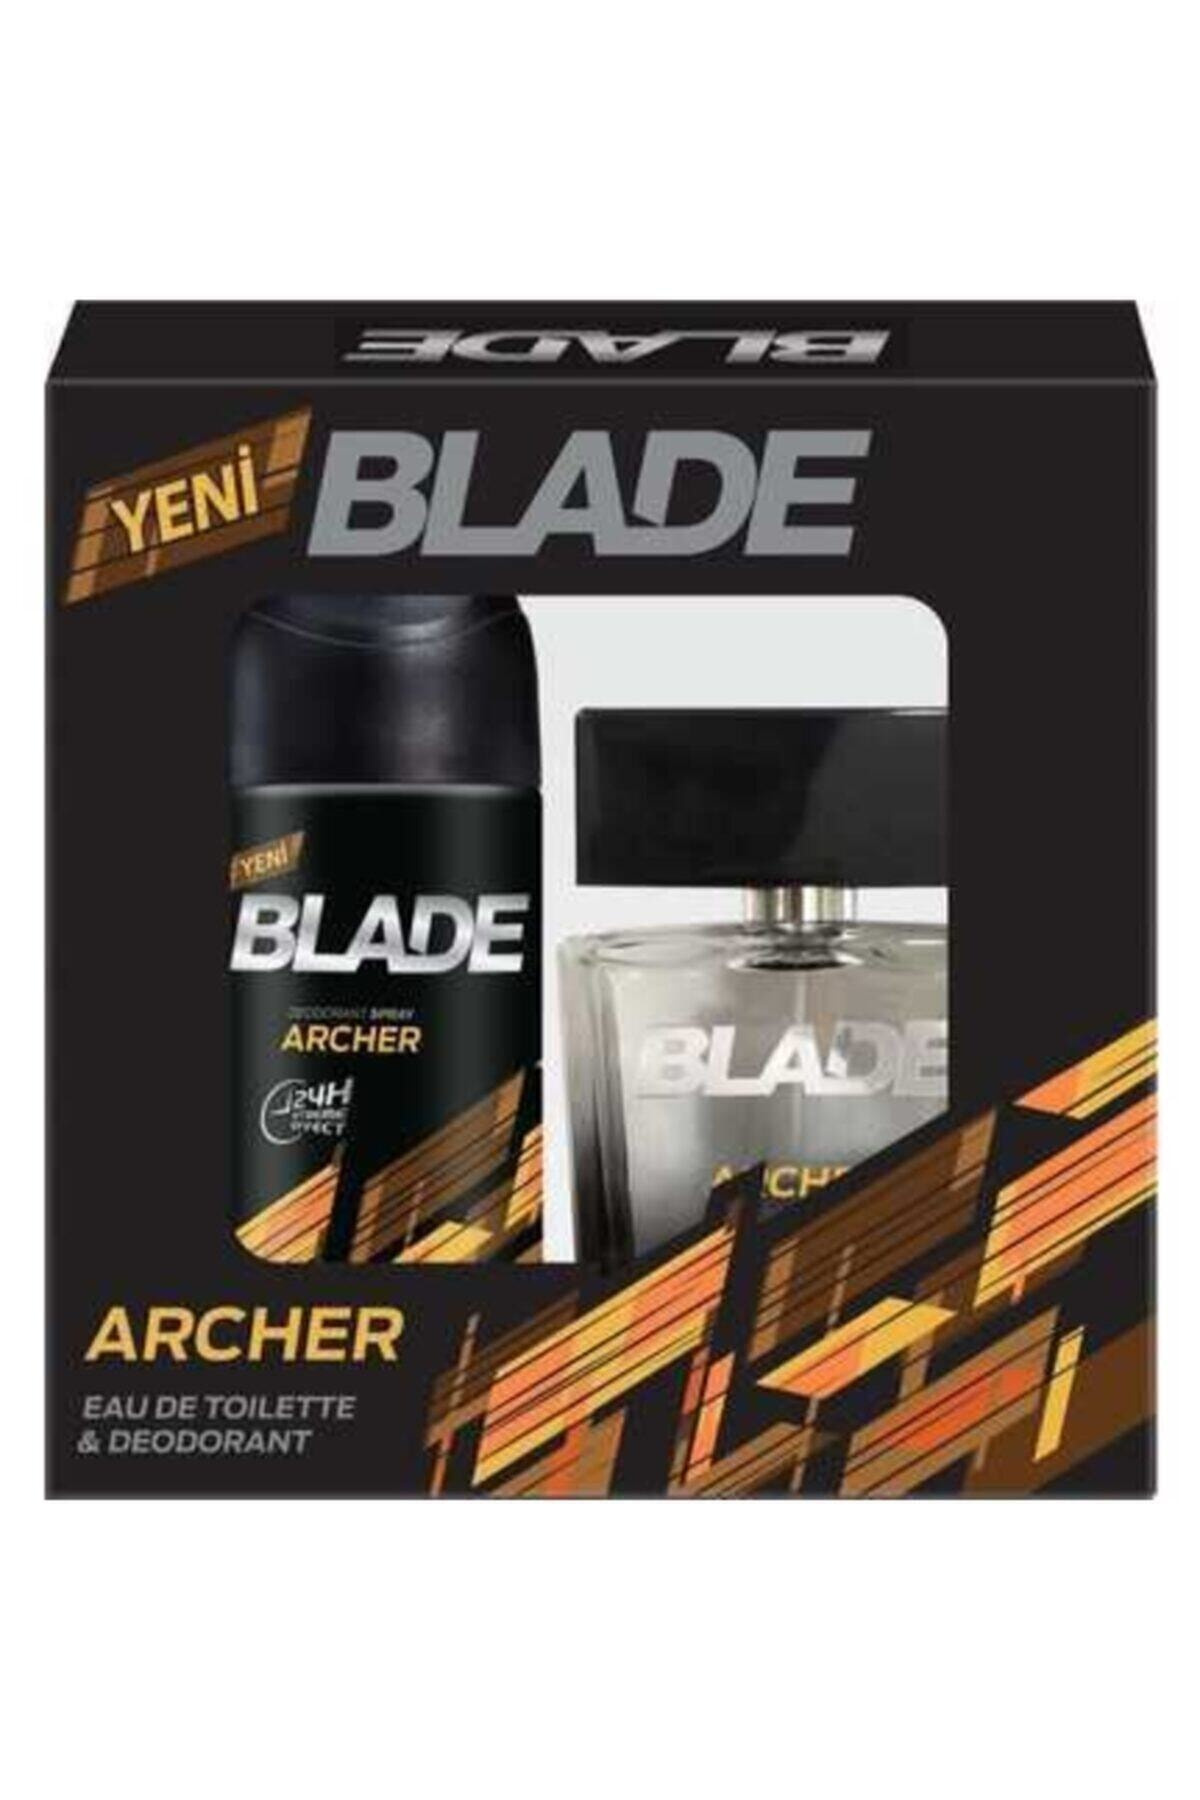 Blade Man Archer Edt 100 ml Erkek Parfüm + 150 ml Deodorant Set 1